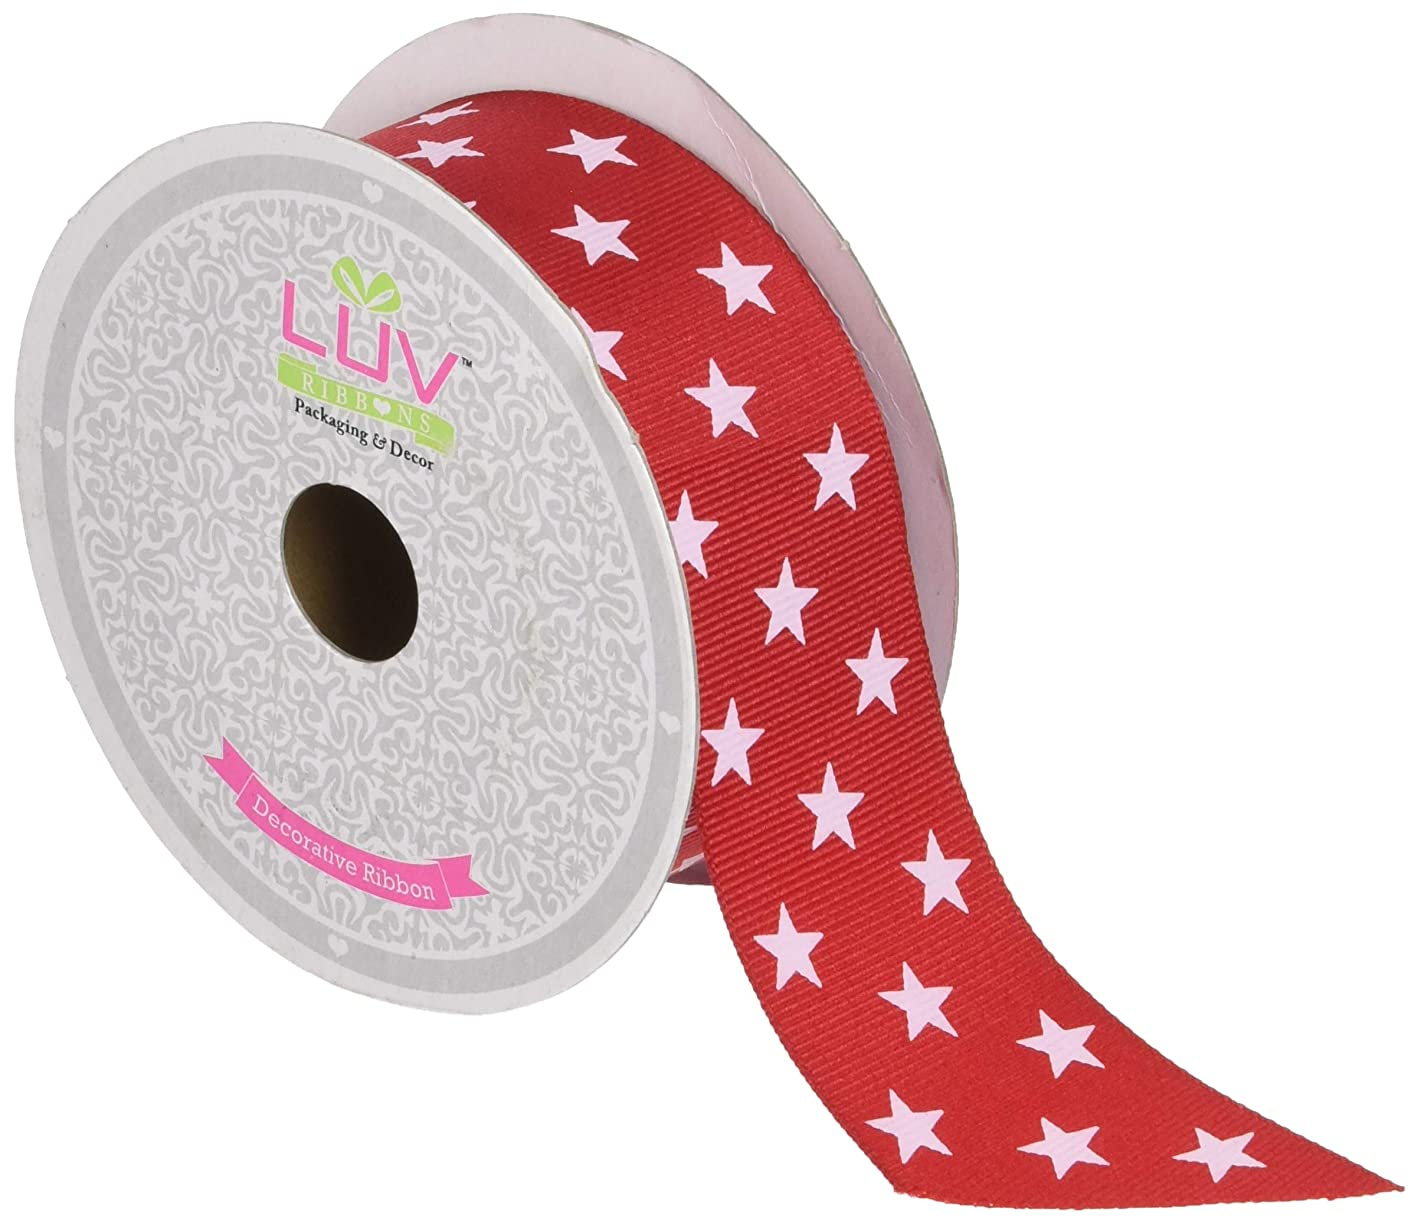 Creative Ideas GCS1102-250 Grosgrain Cosmic Star Ribbon, 1 1/2